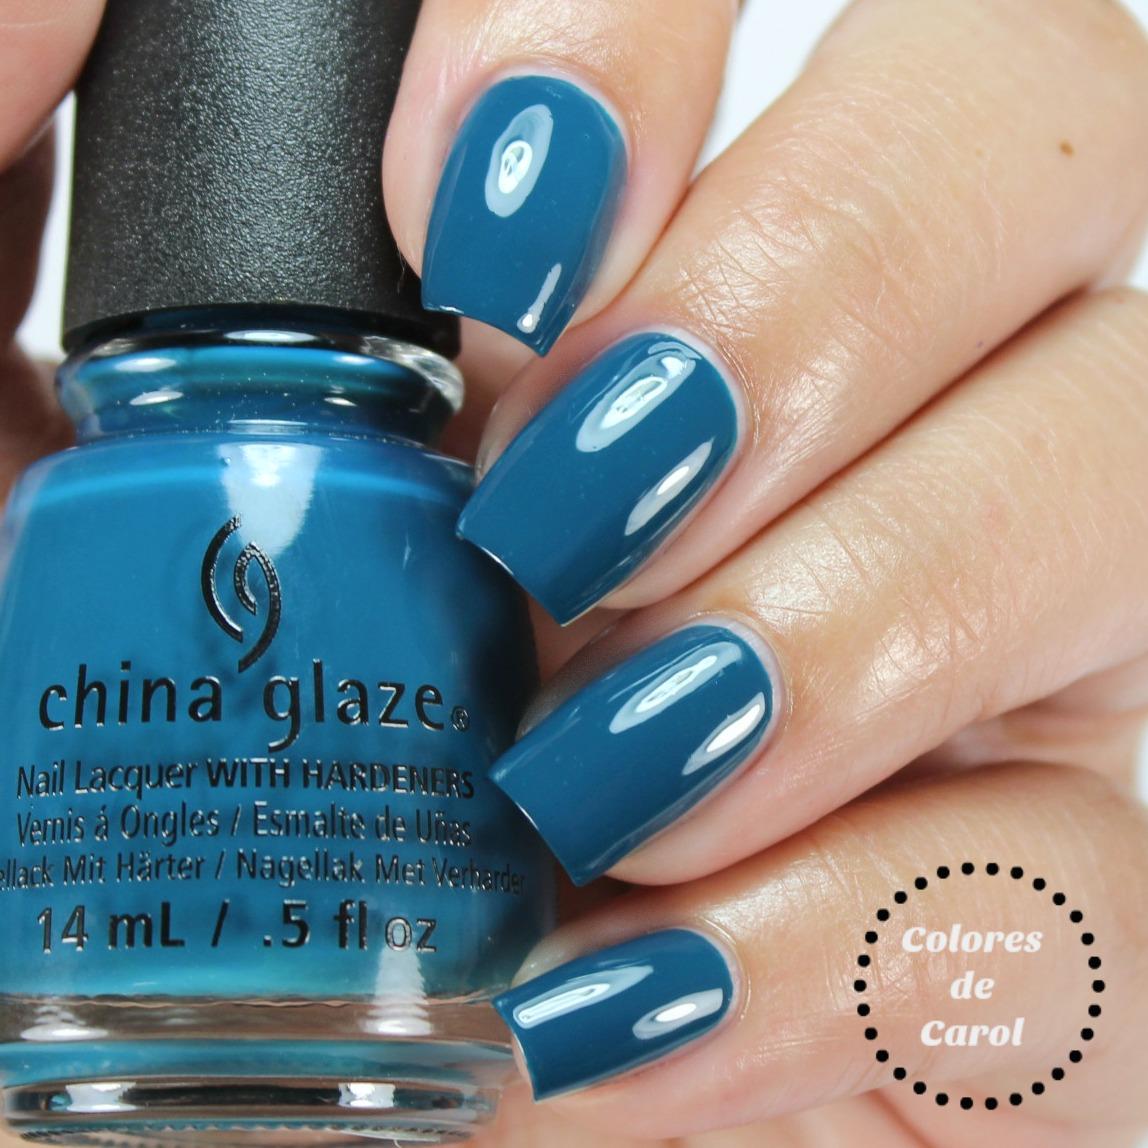 Colores de Carol: China Glaze Rebel Collection, Fall 2016